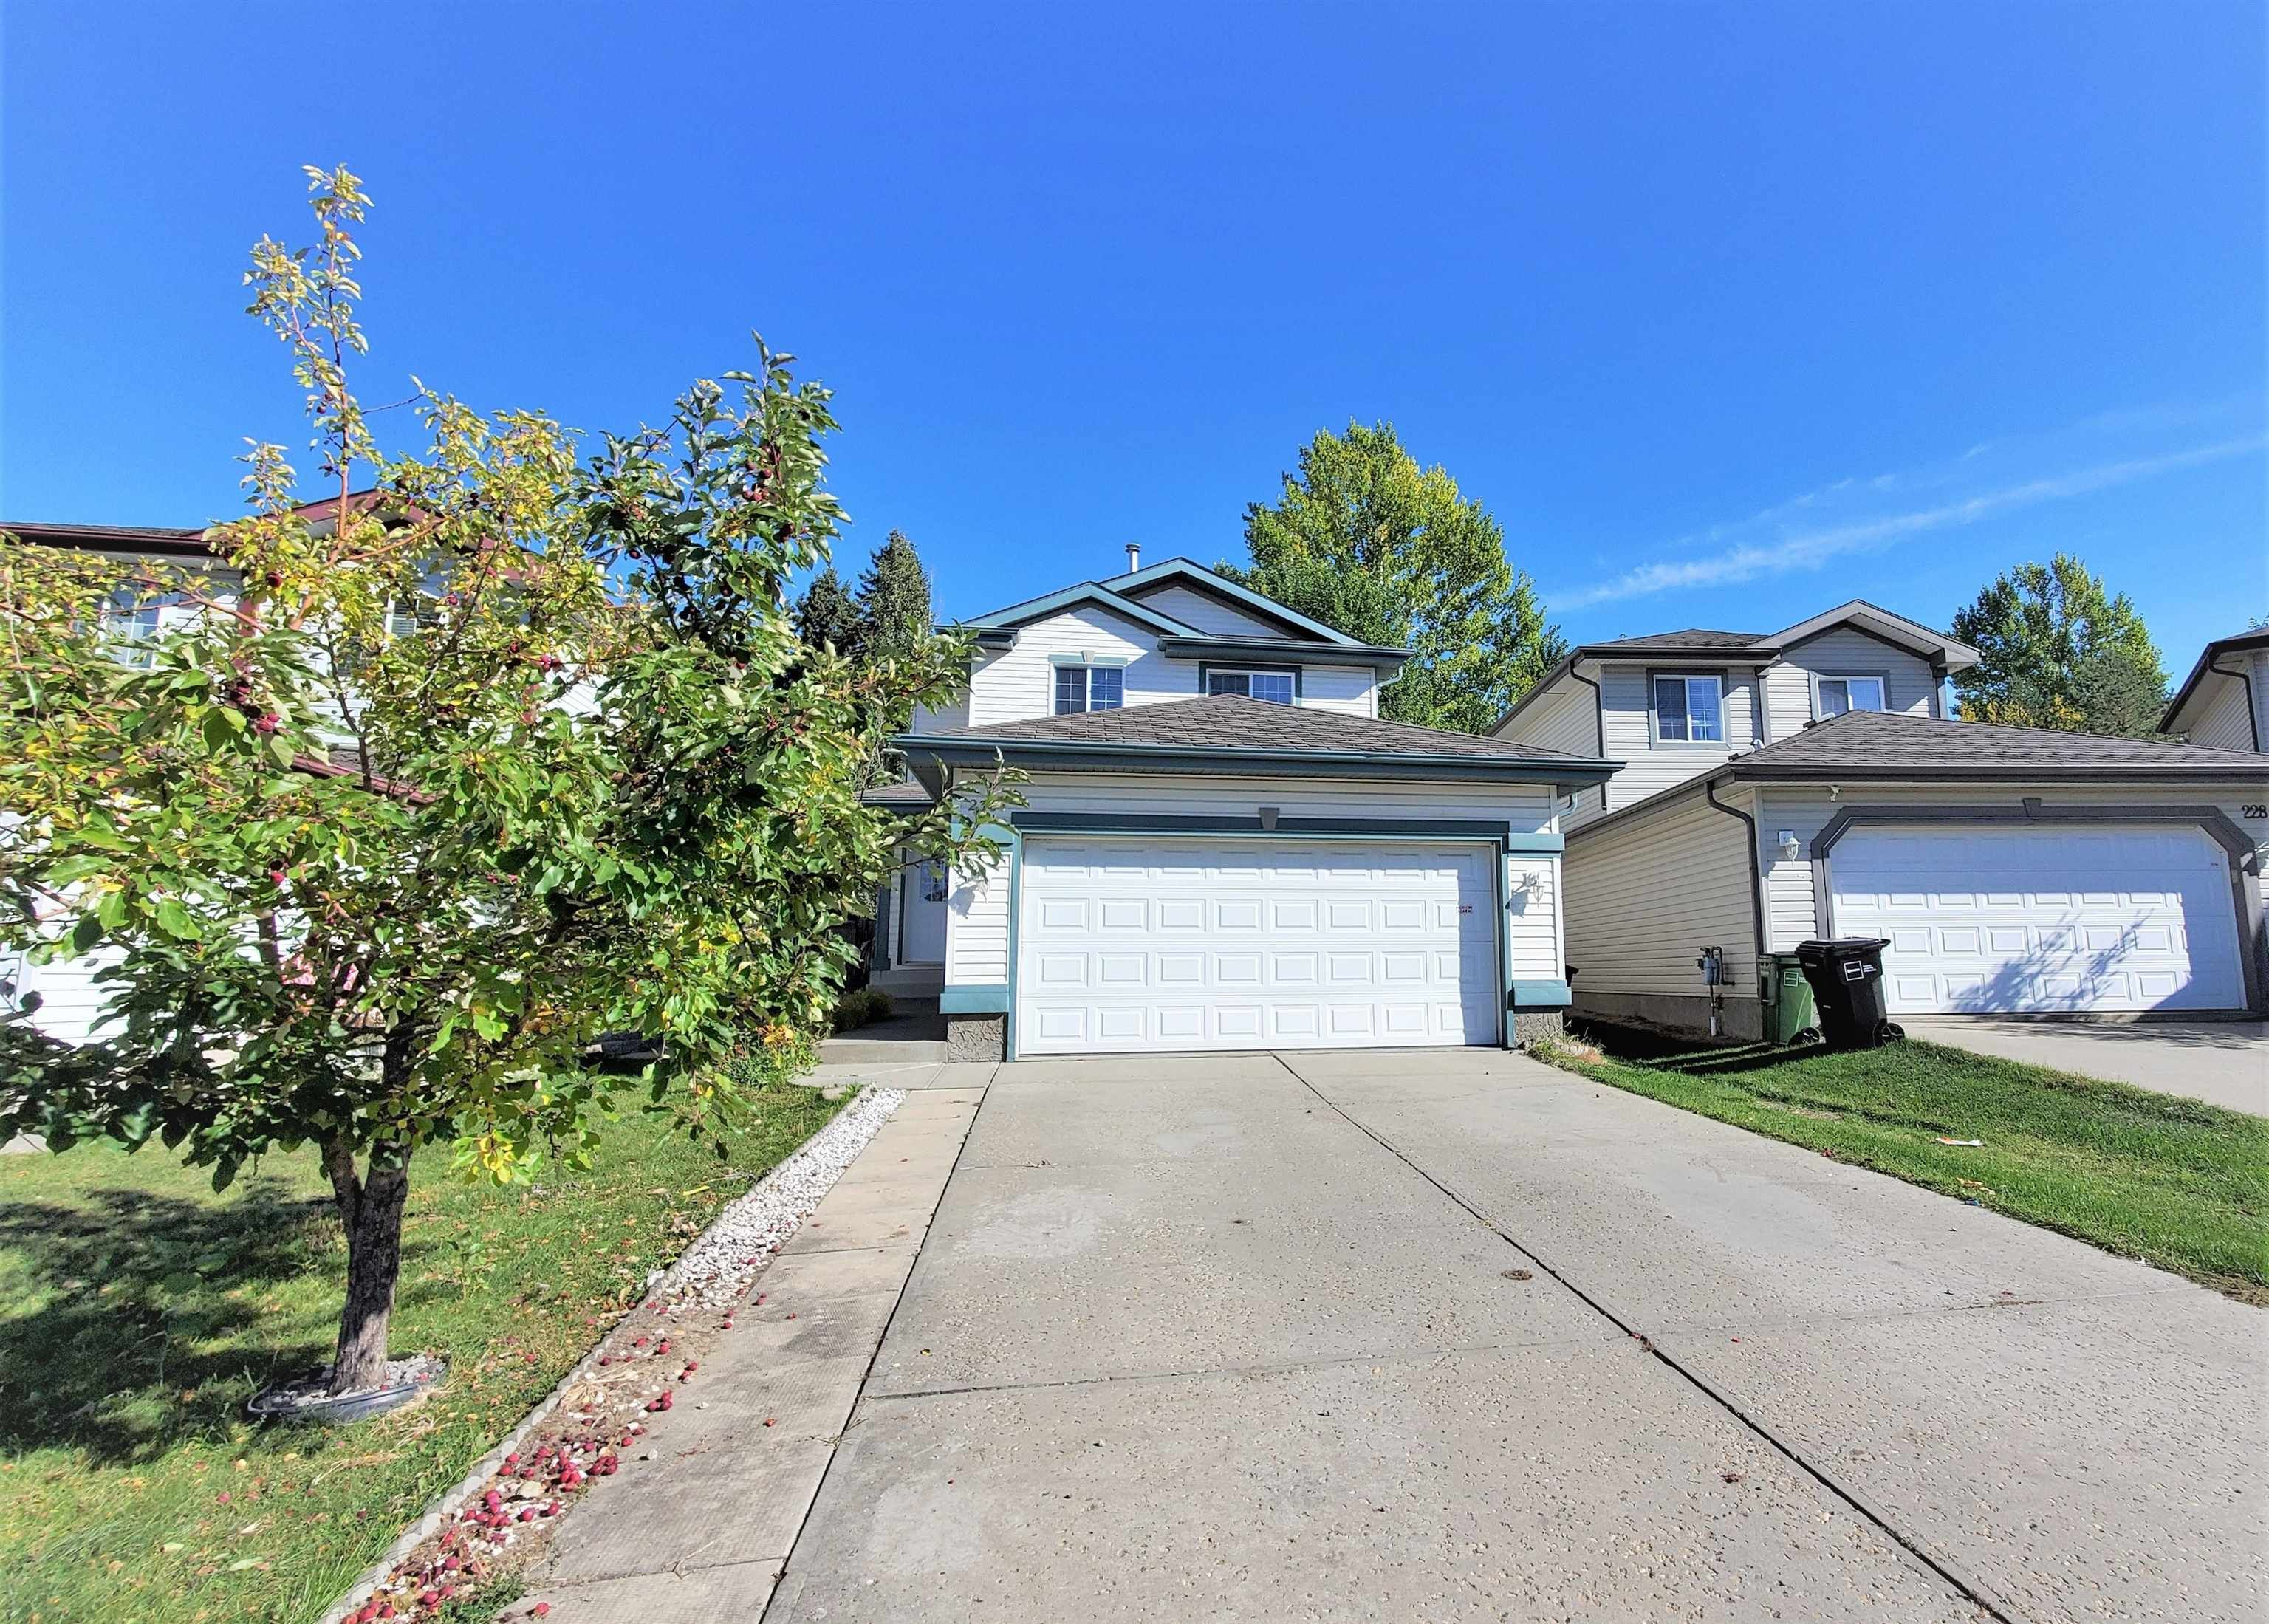 Main Photo: 230 HYNDMAN Crescent in Edmonton: Zone 35 House for sale : MLS®# E4264203